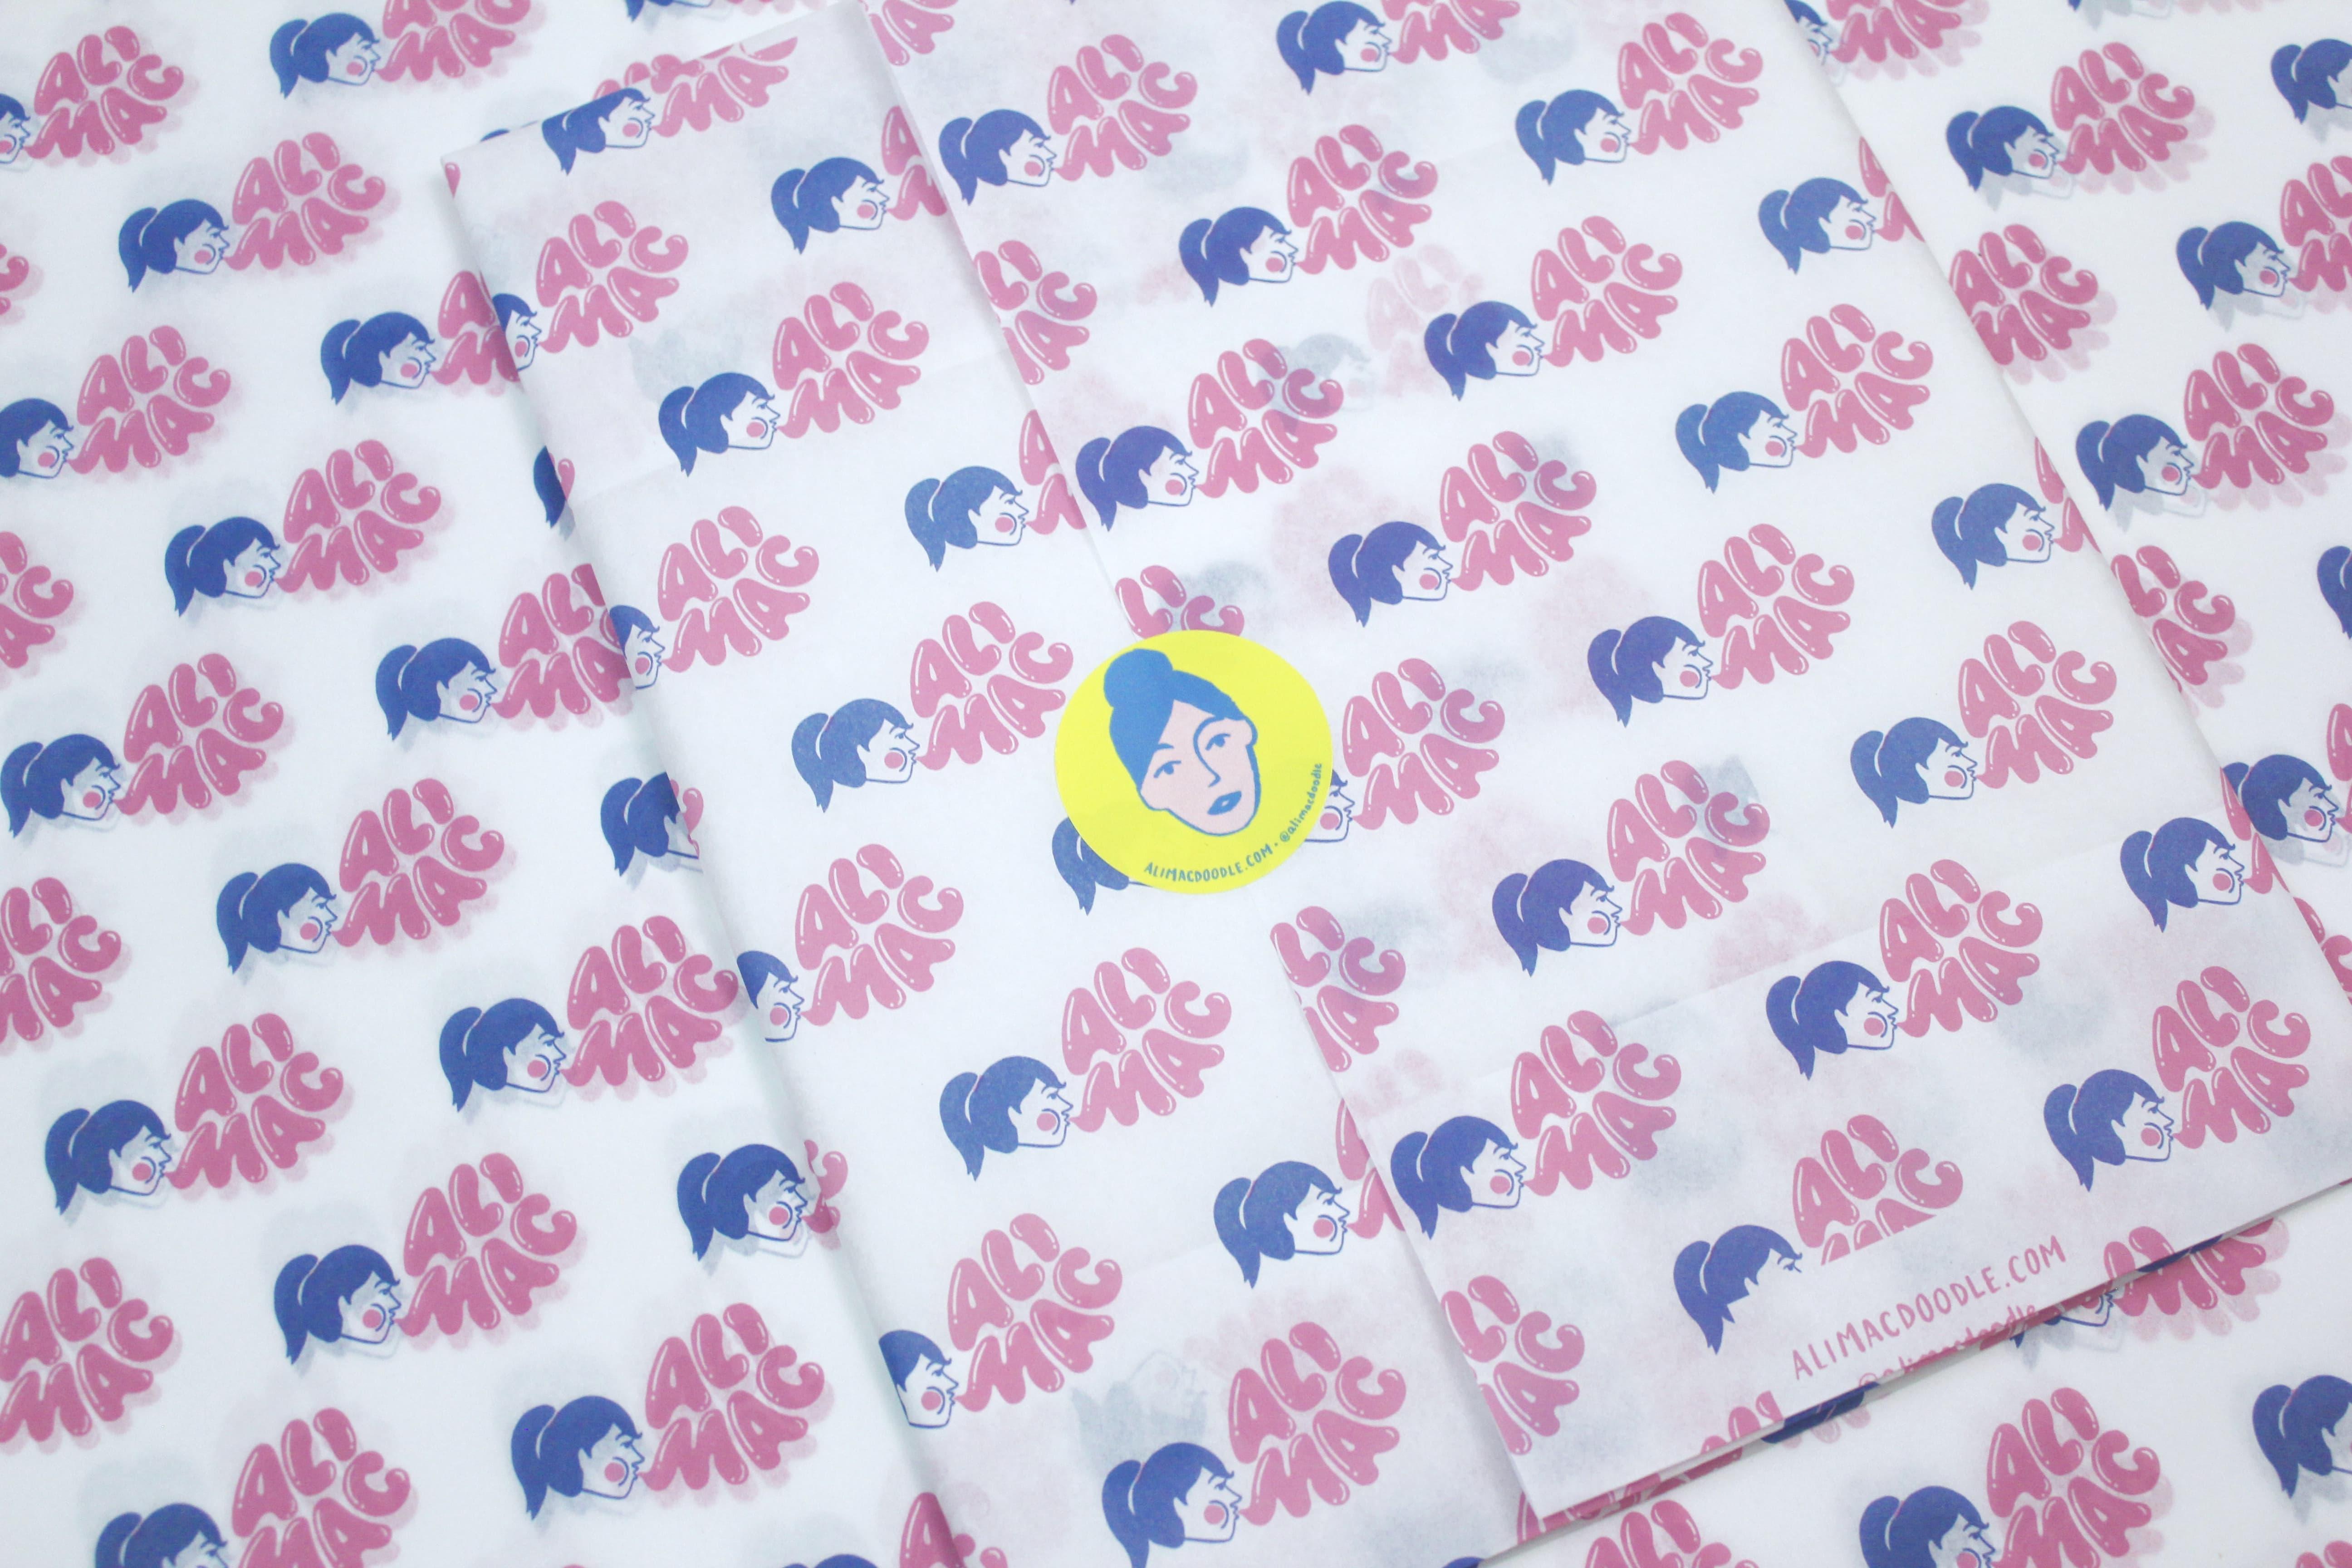 Ali Mac custom tissue paper